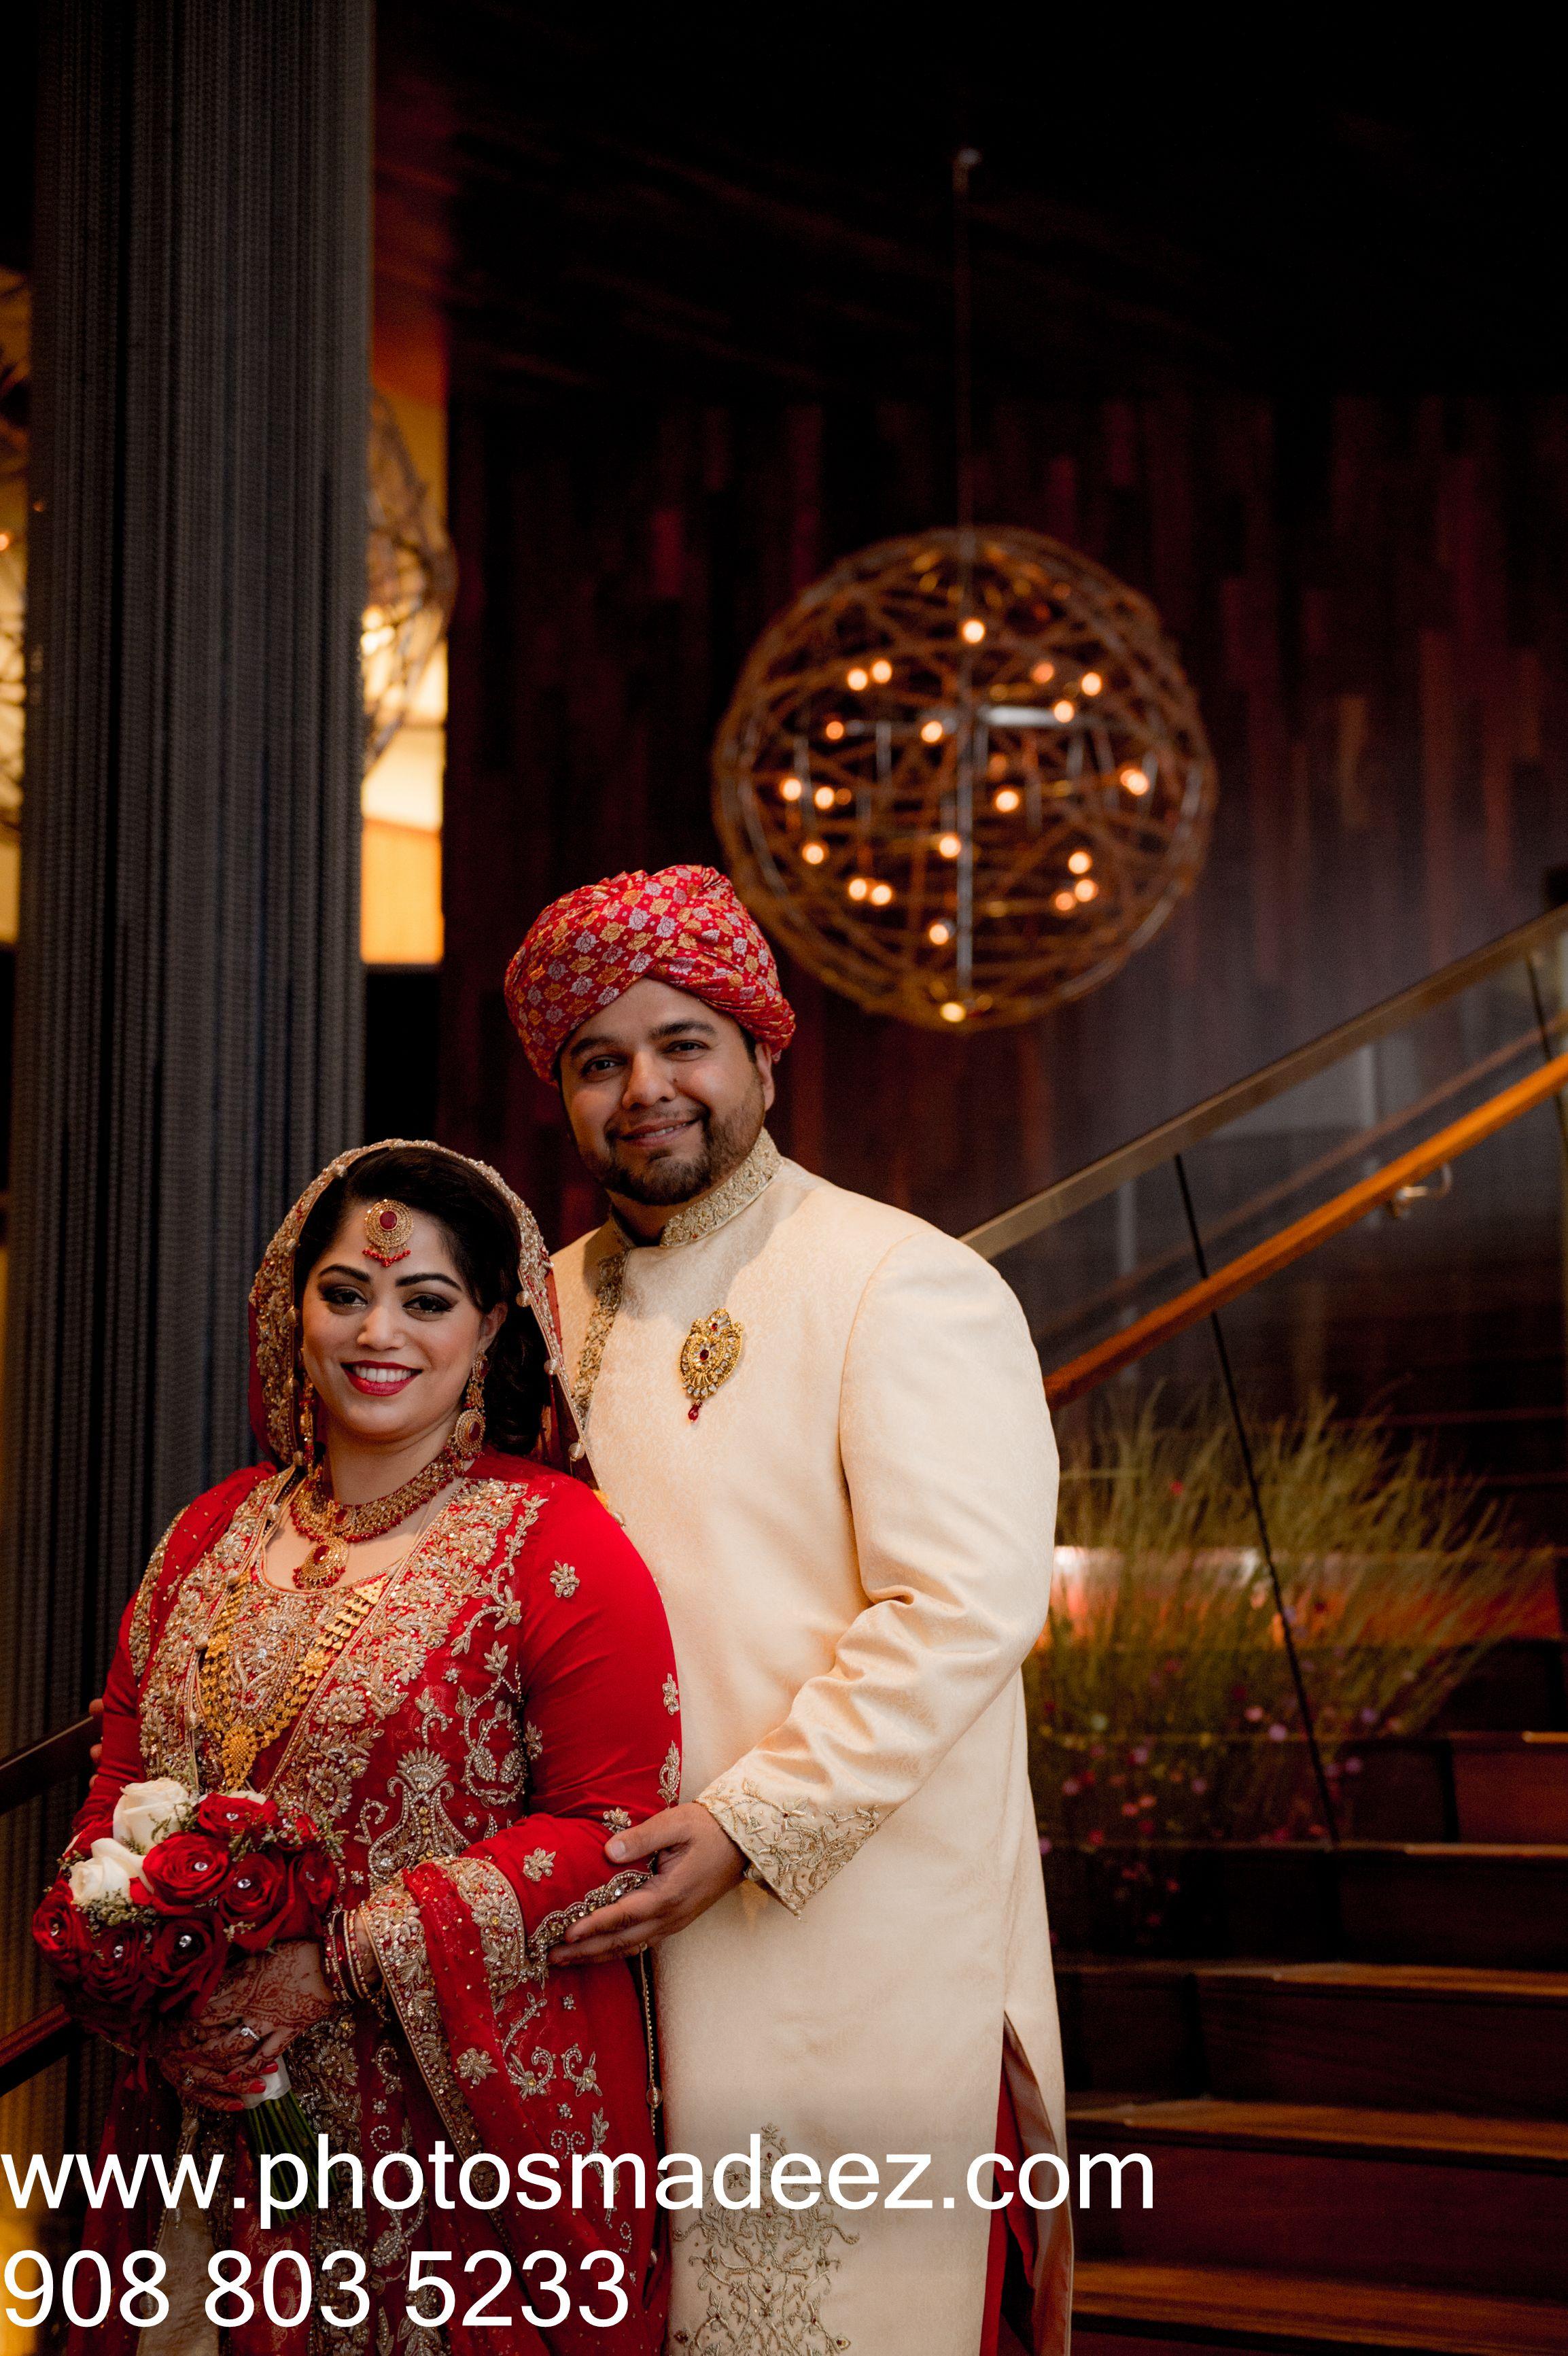 Indian Wedding Pakistani Along With Bridal Arts And Events At New Brunswick Hyatt NJ Muslim Best Photographer